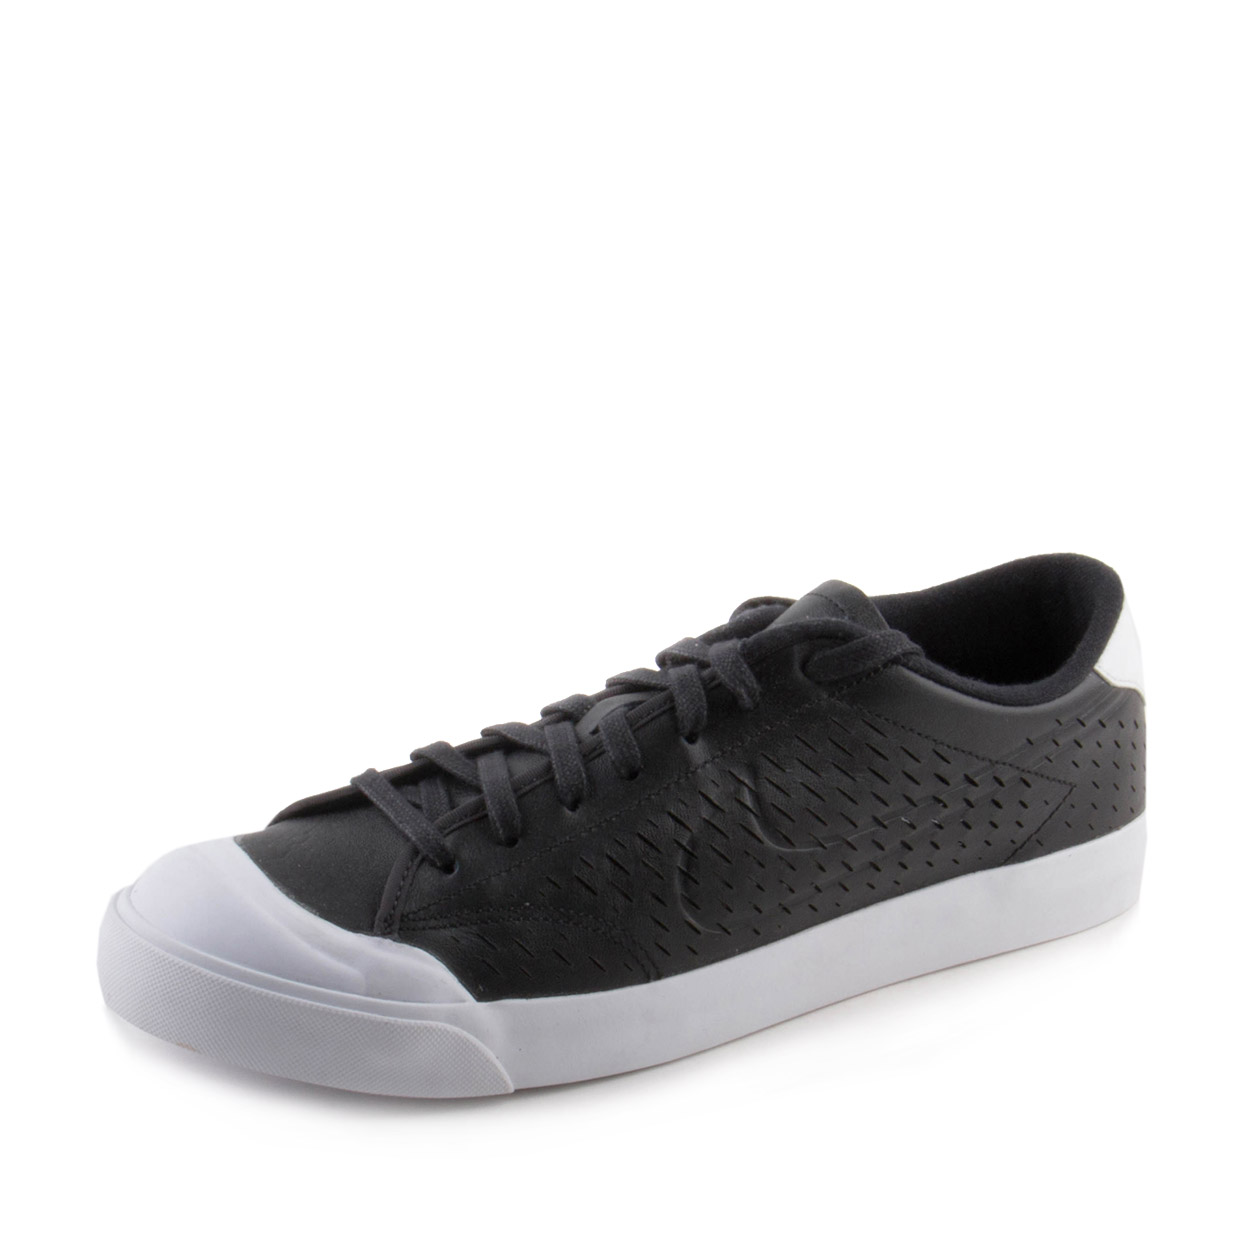 Kenia Artificial césped  Nike - Nike Mens All Court 2 Low Leather Black/White 724271-002 -  Walmart.com - Walmart.com